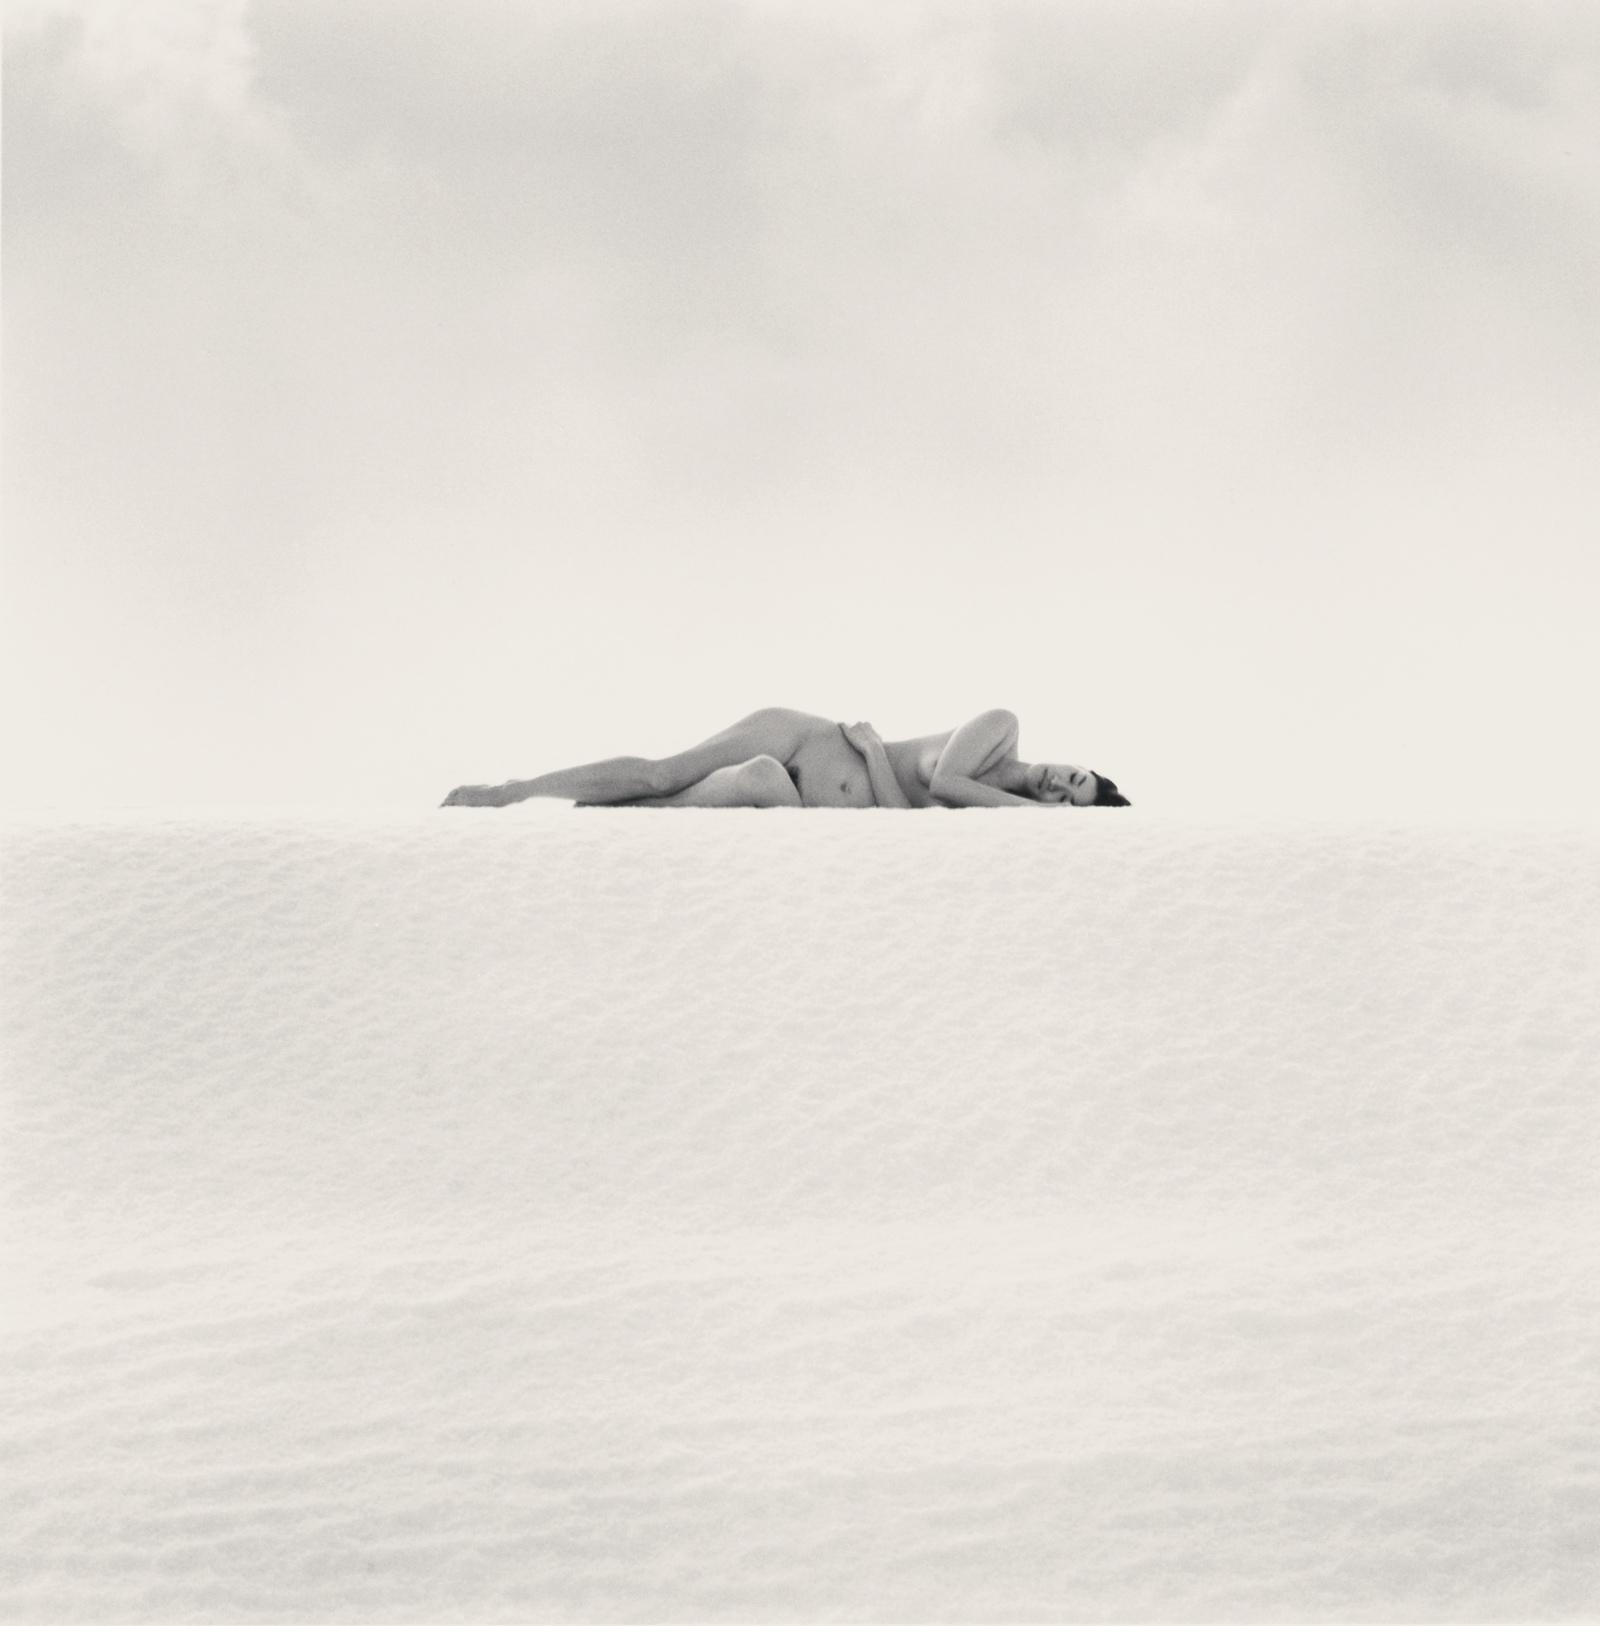 Michael Kenna 'Mina, Study 4' Japan, 2011, Courtesy of Blue Lotus Gallery